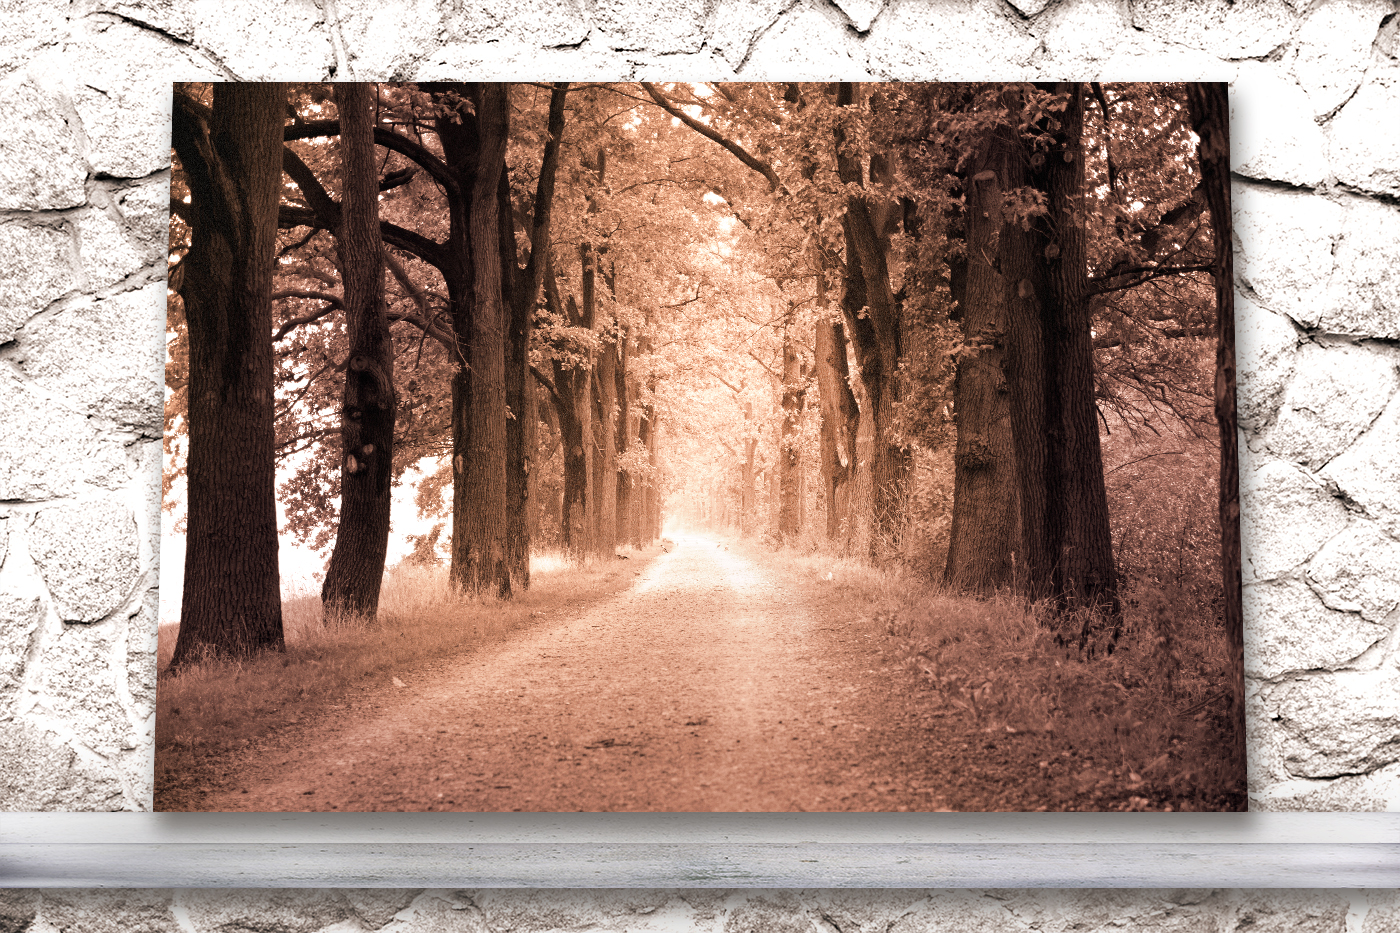 Nature photo, landscape photo, autumn alley photo, example image 4